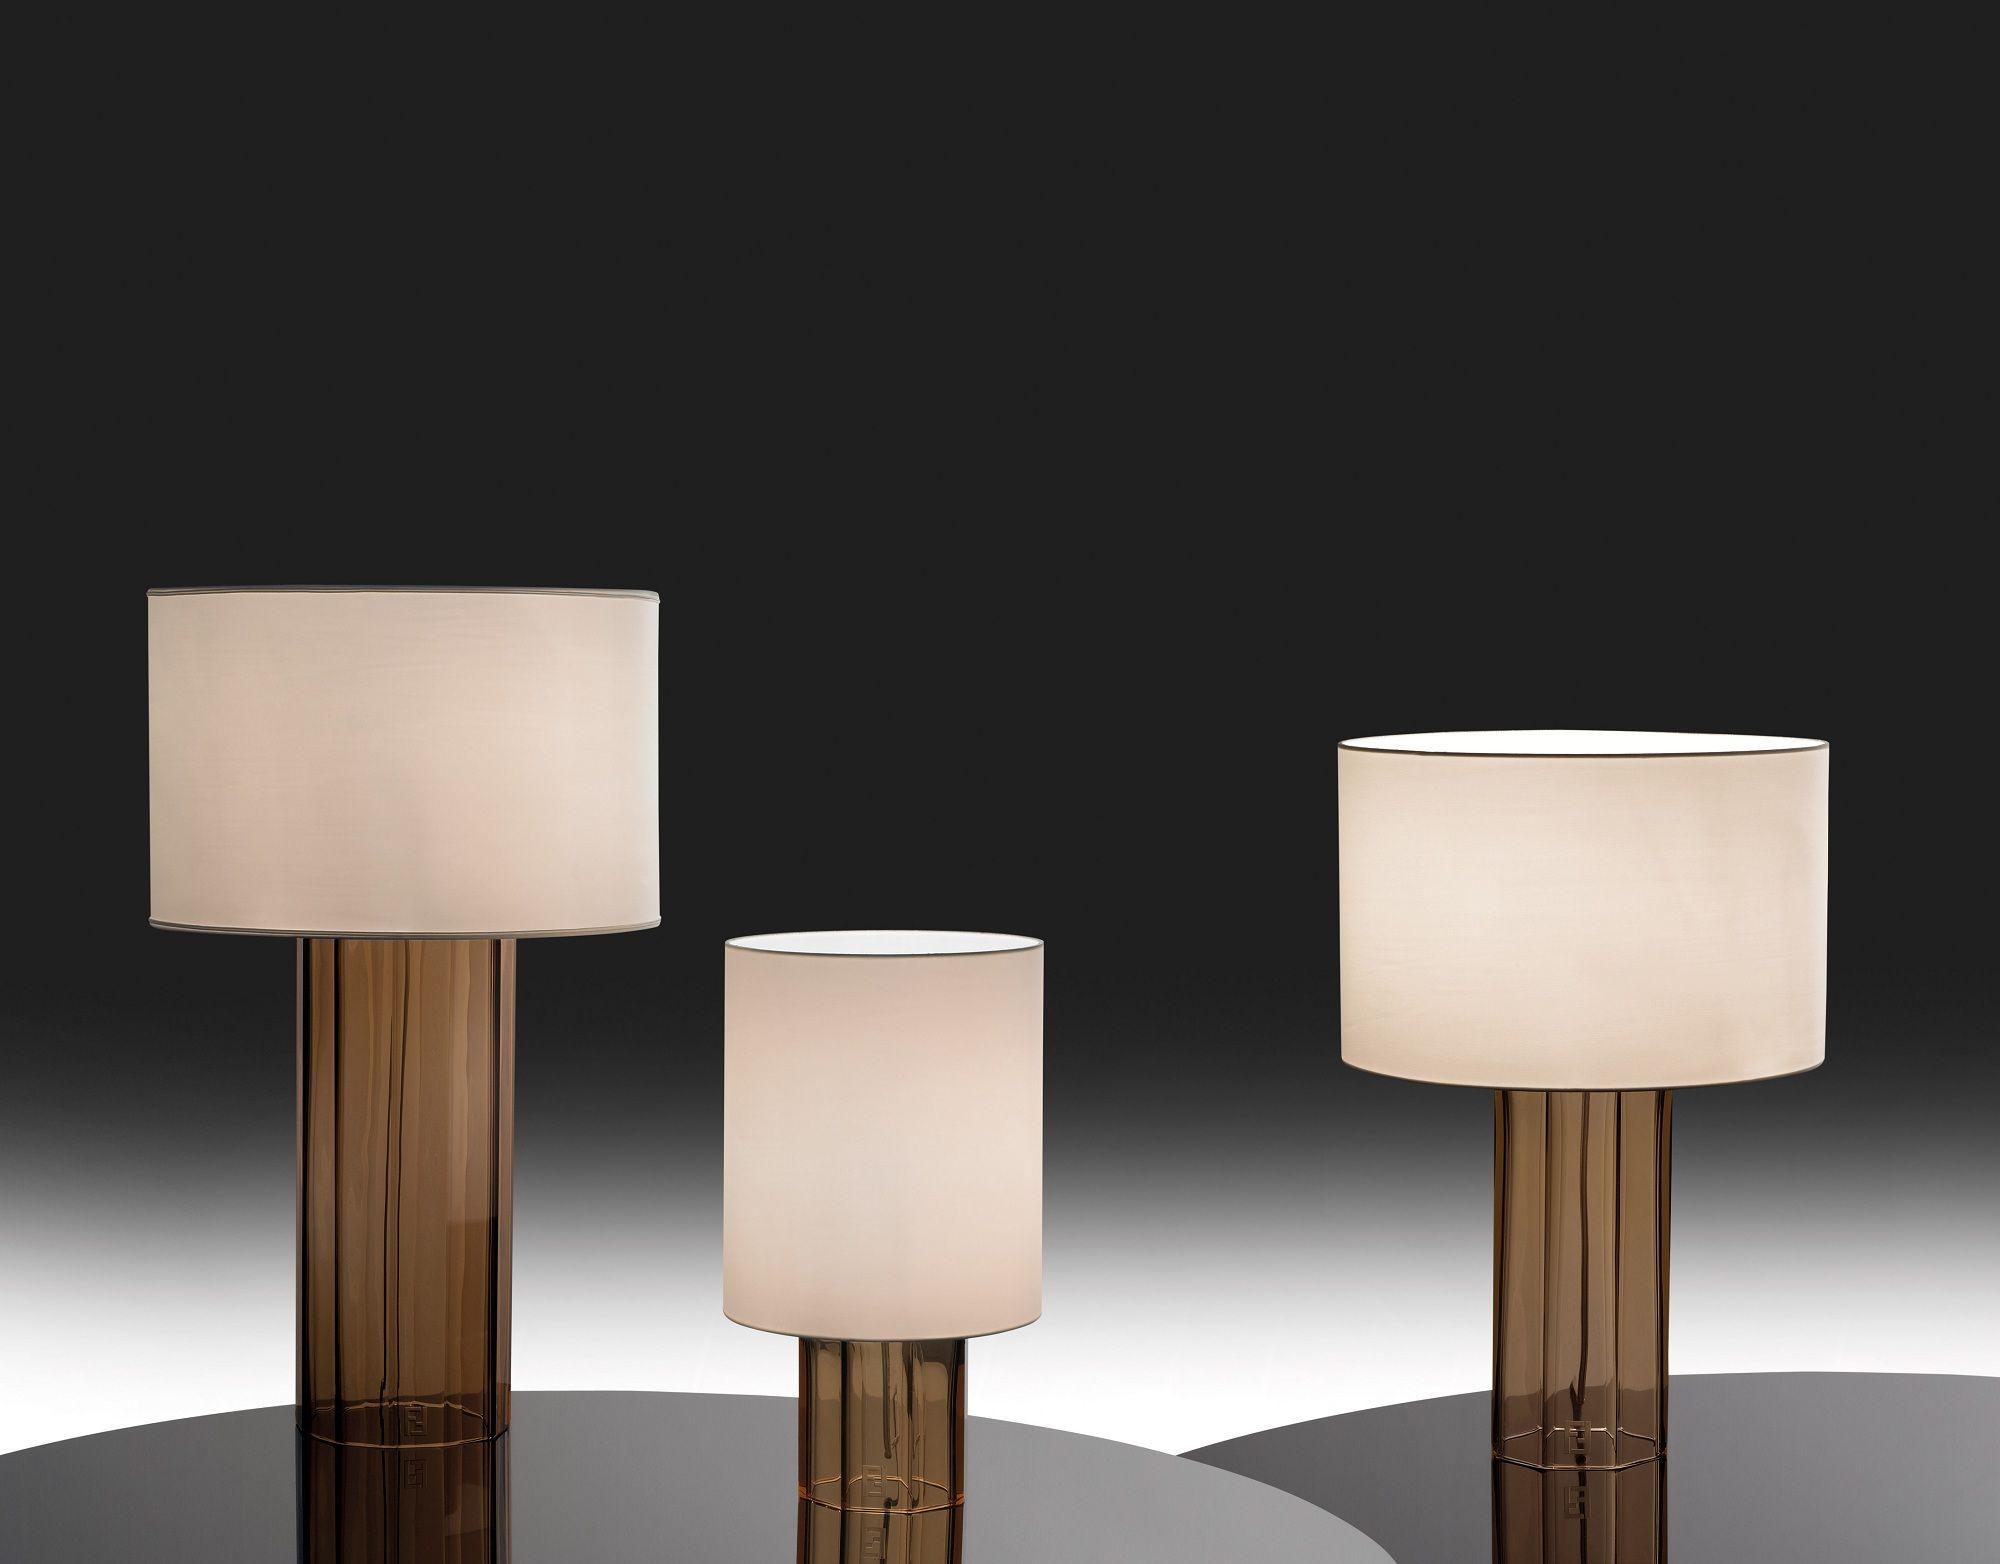 fendi casa lighting. berlin table lamp by fendi casa lighting pinterest